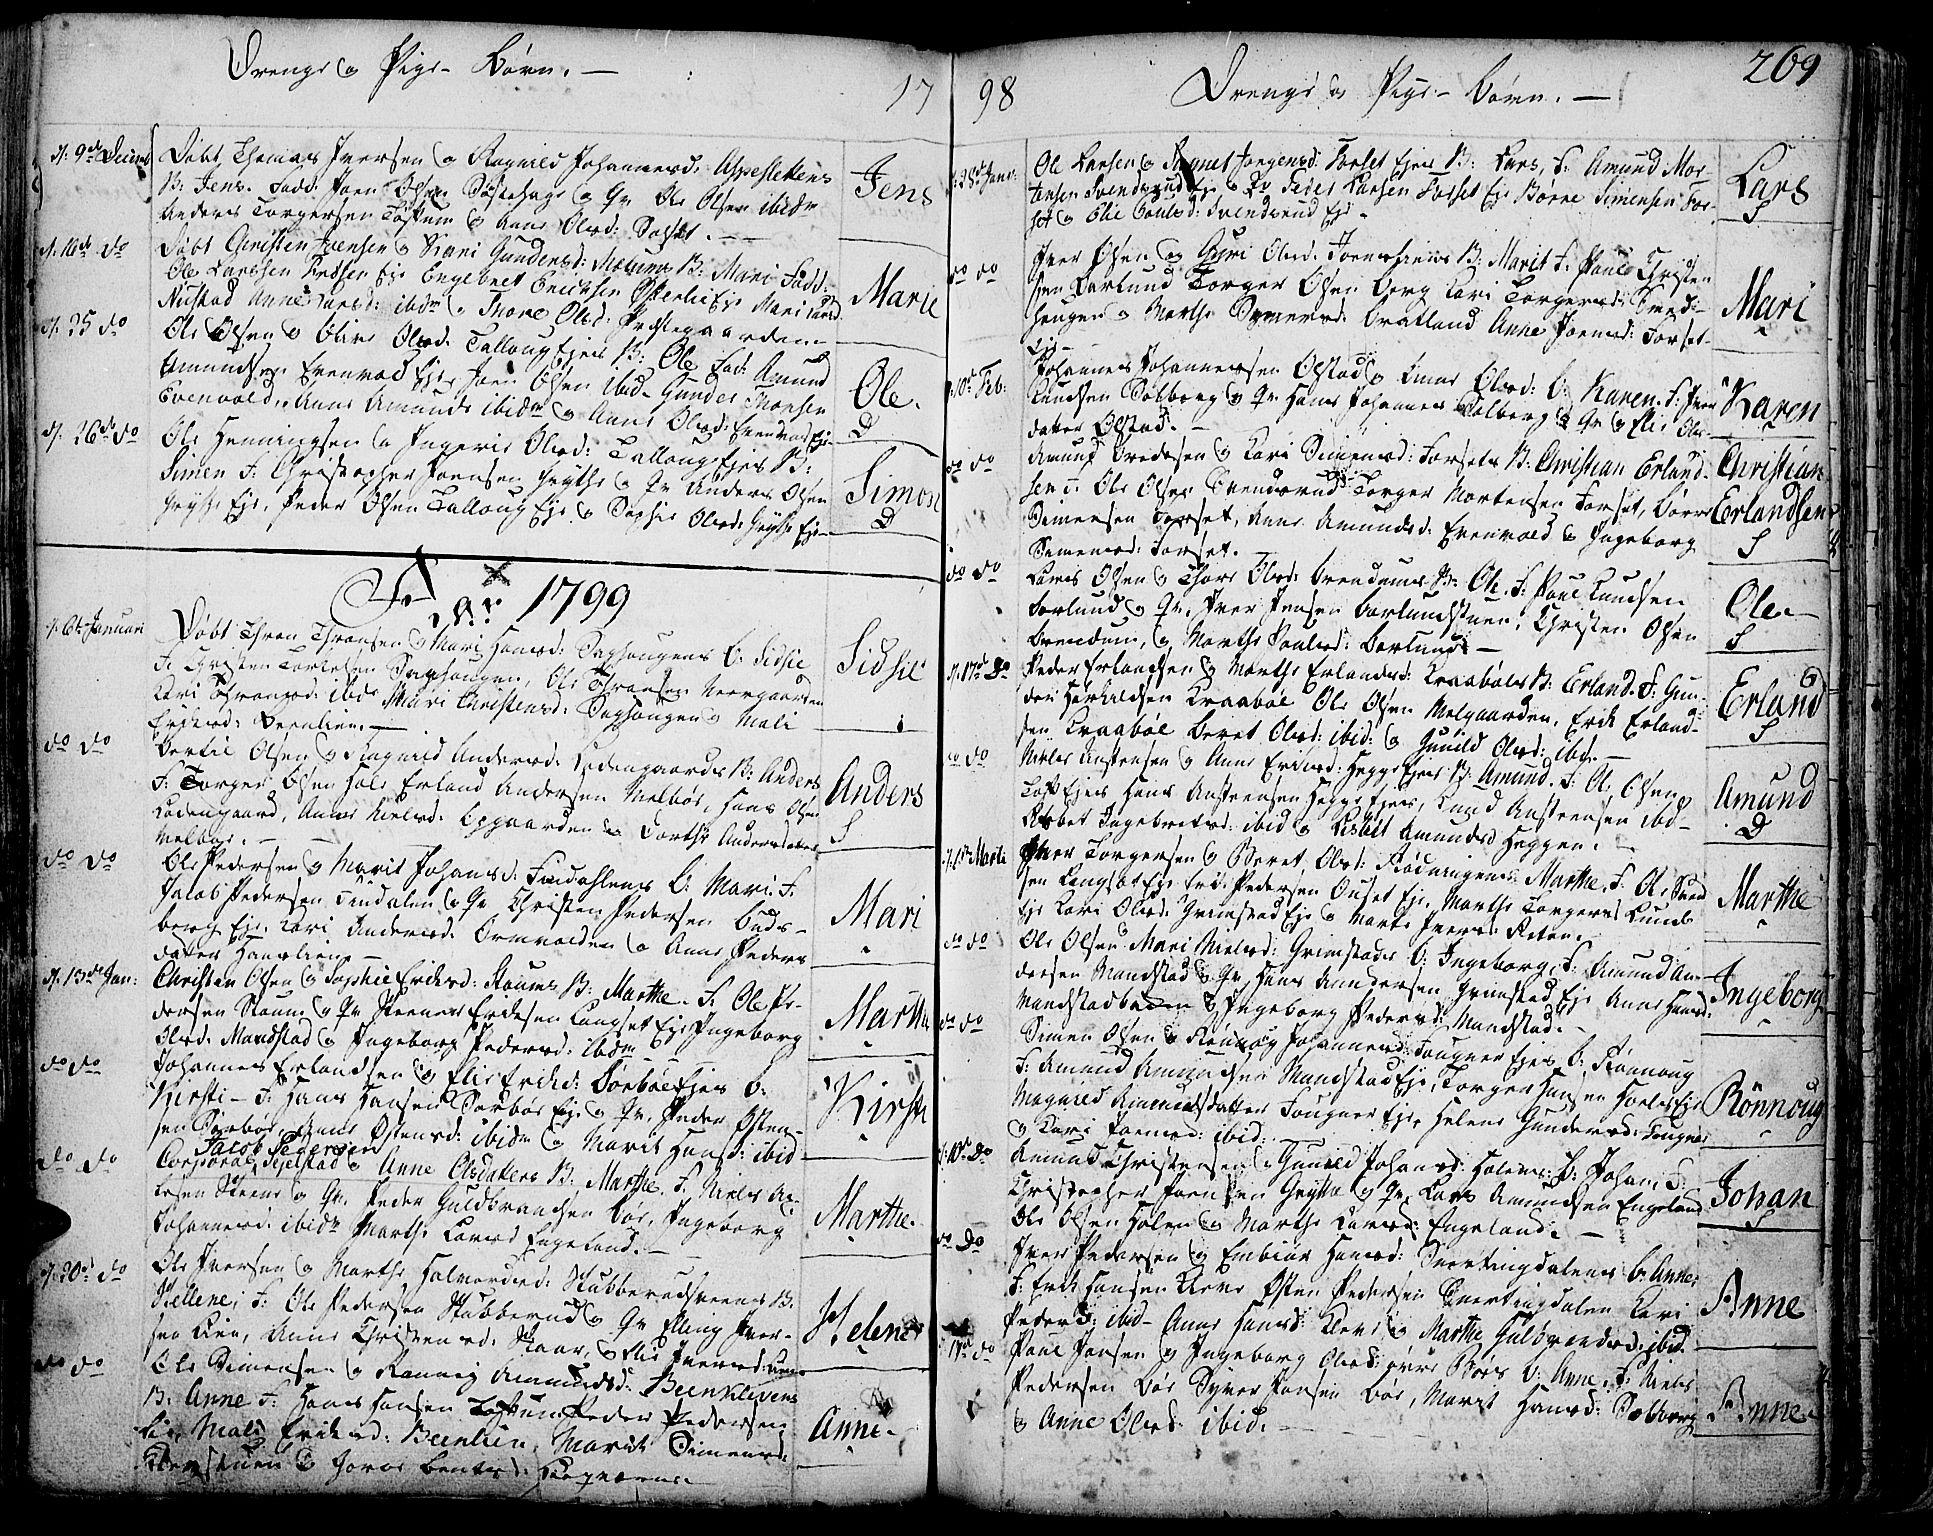 SAH, Gausdal prestekontor, Ministerialbok nr. 3, 1758-1809, s. 269